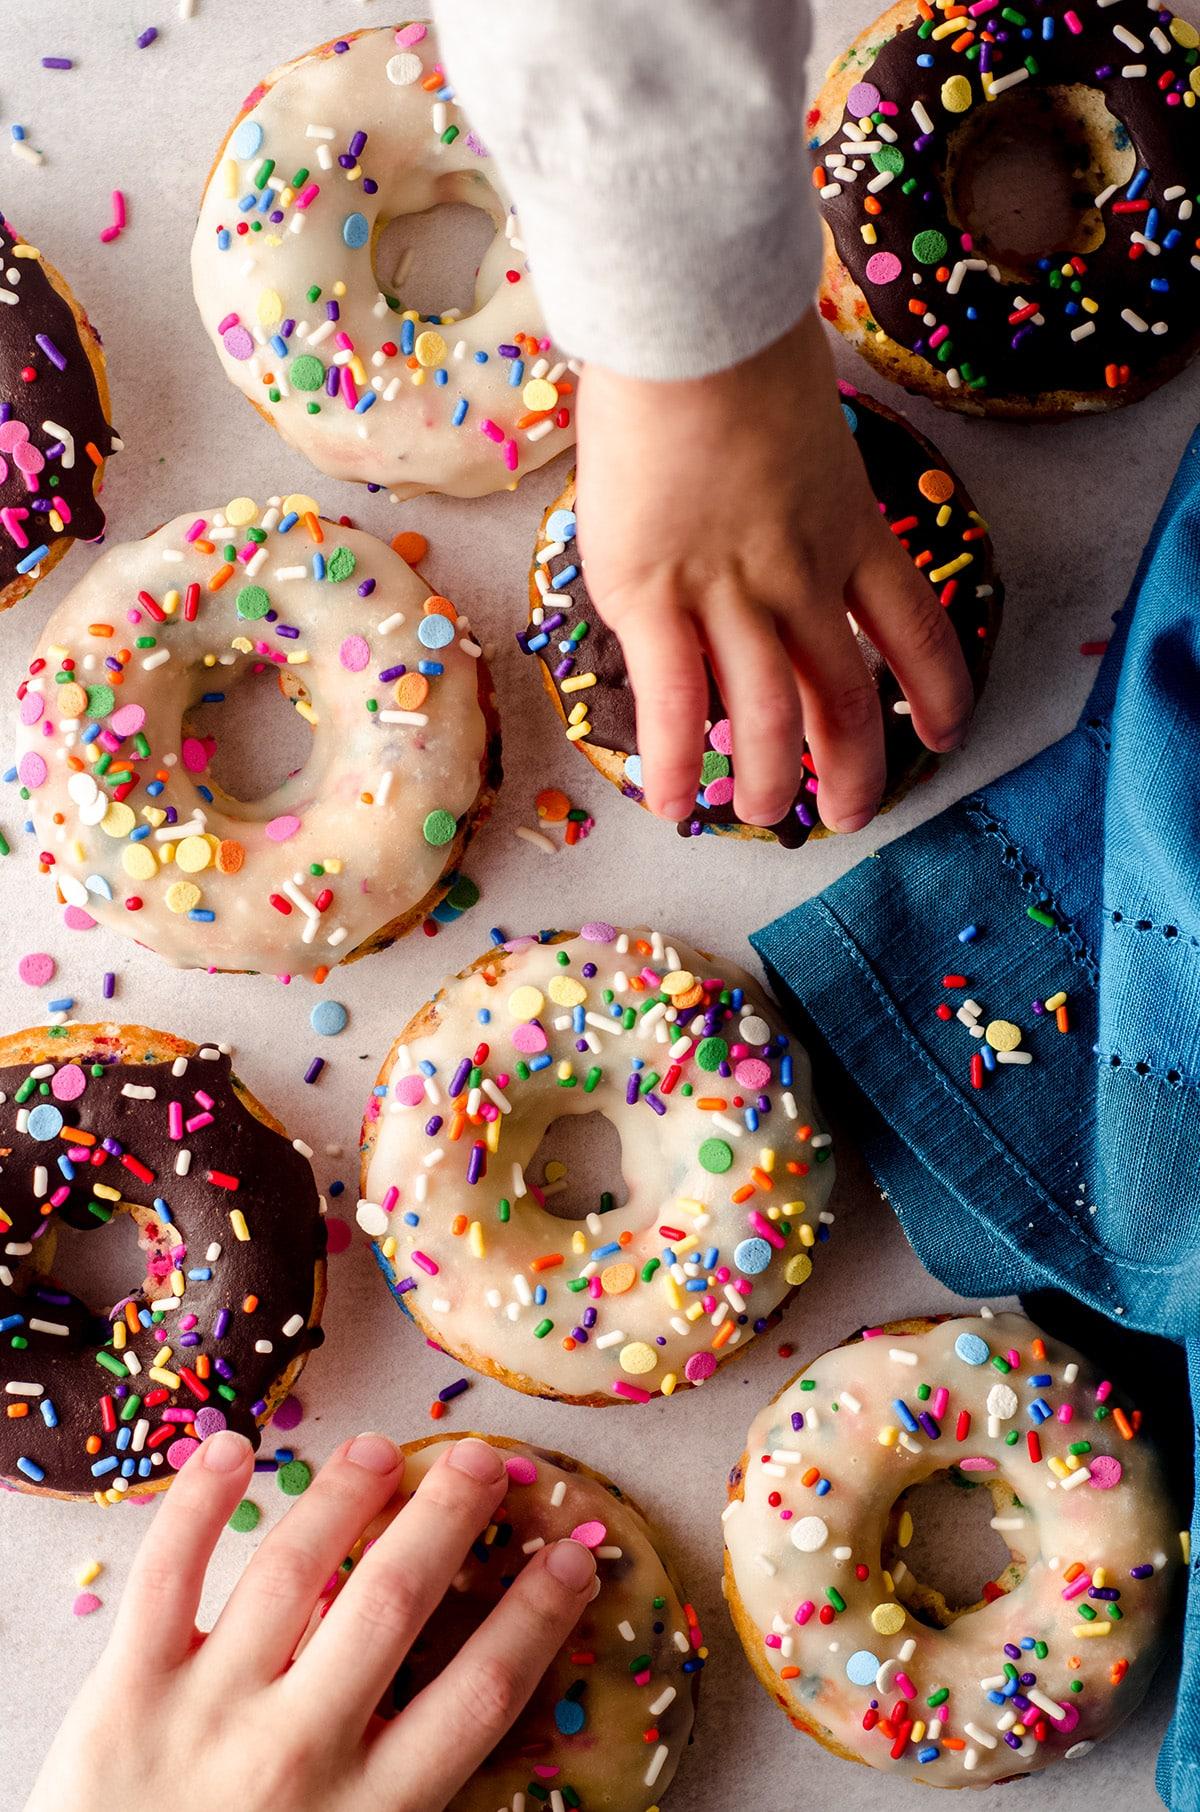 aerial photo of children's hands grabbing funfetti donuts